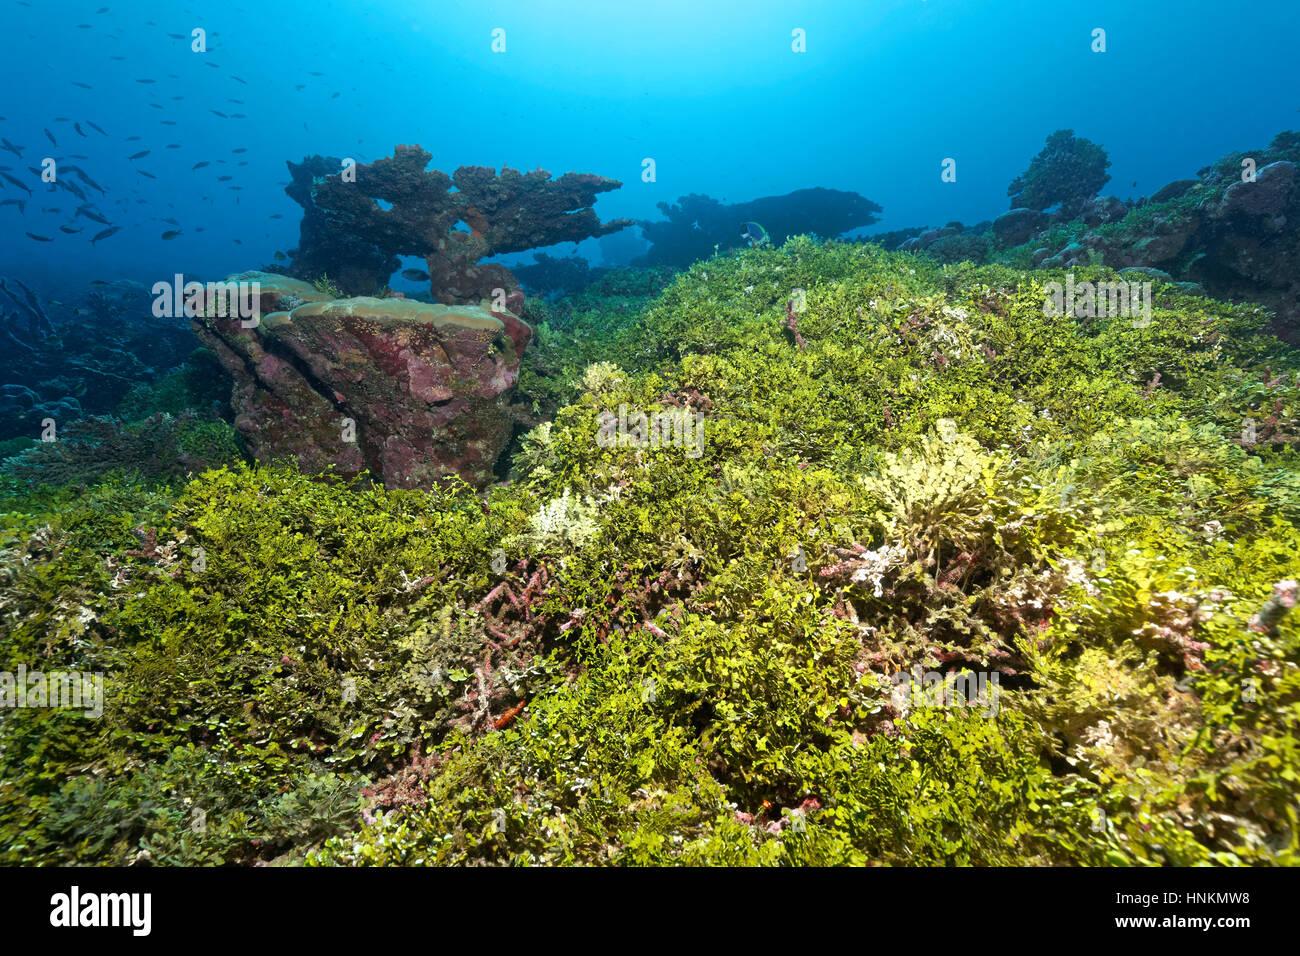 Korallenriff, Verschmutzung, Halimeda Algen (Halimeda Copiosa), Indischer Ozean, Malediven Stockbild